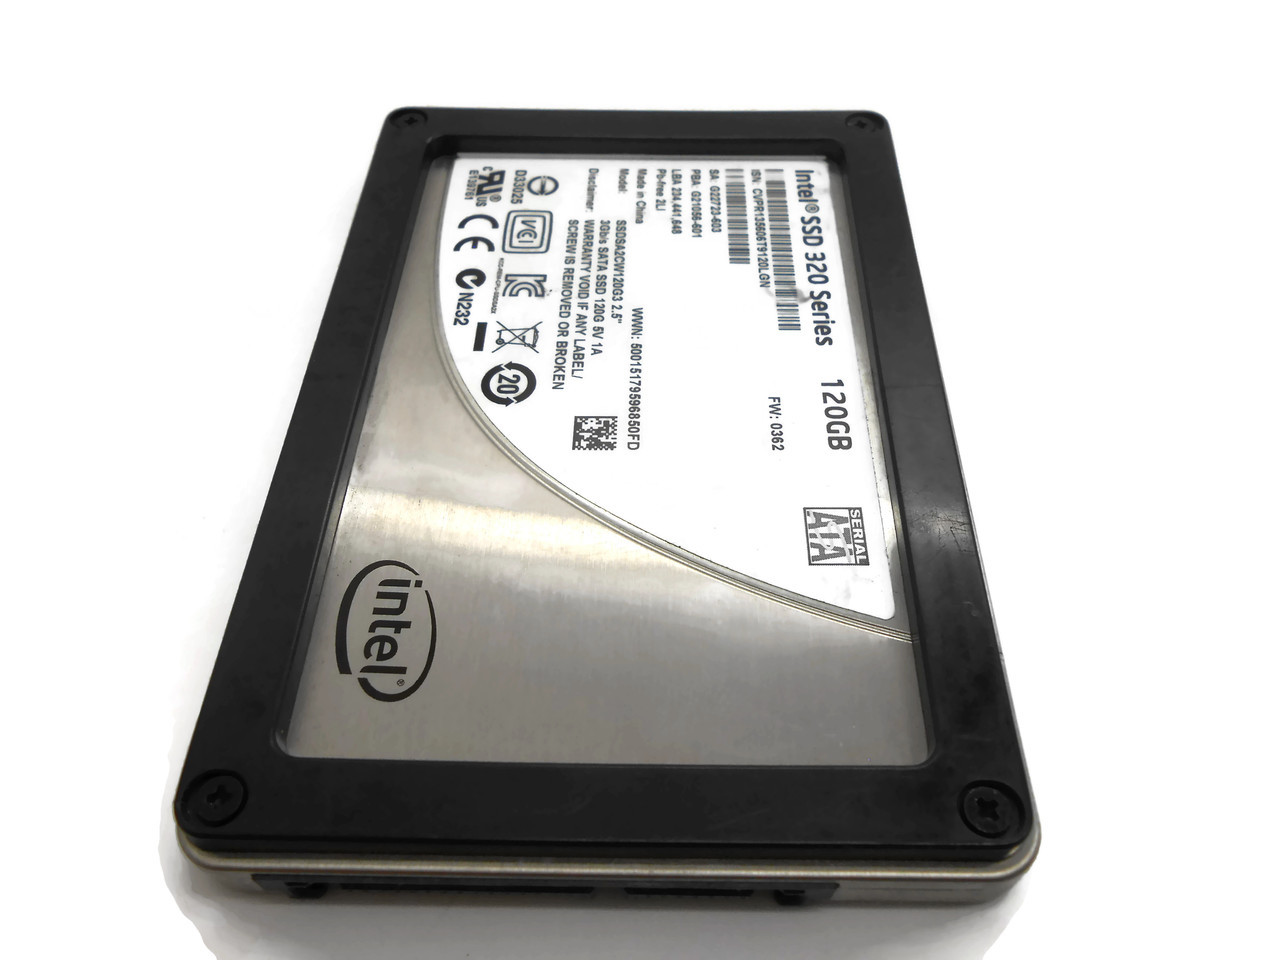 HP Intel 320 Series 120GB 3Gbps SSD Drive G22723-603 G21056-601